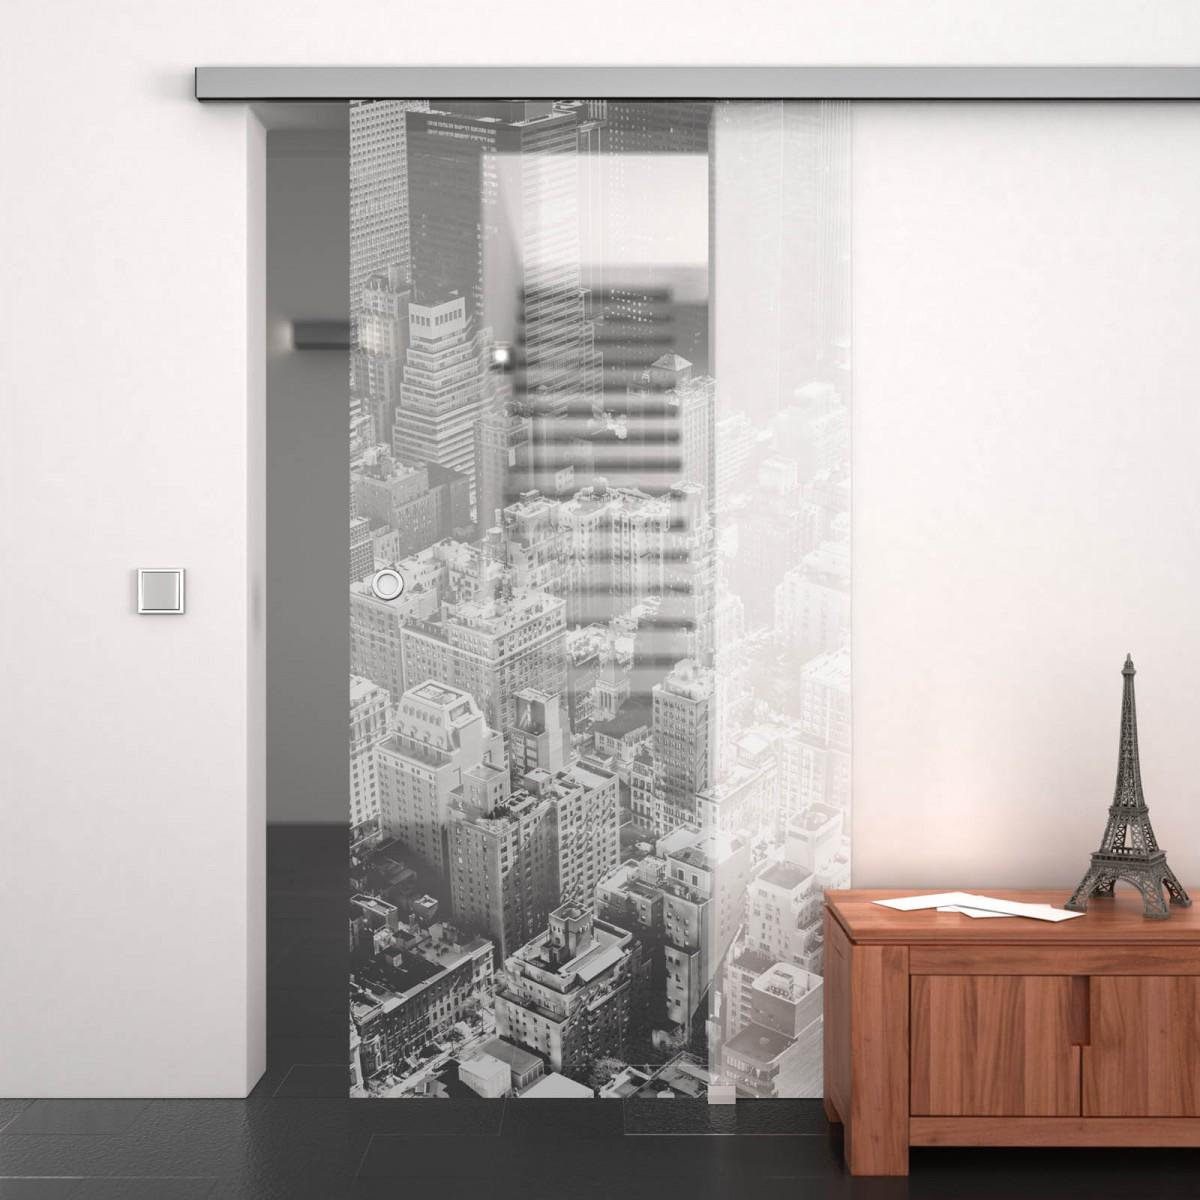 glasschiebet r gelasert mit motiv stadt 989708047. Black Bedroom Furniture Sets. Home Design Ideas